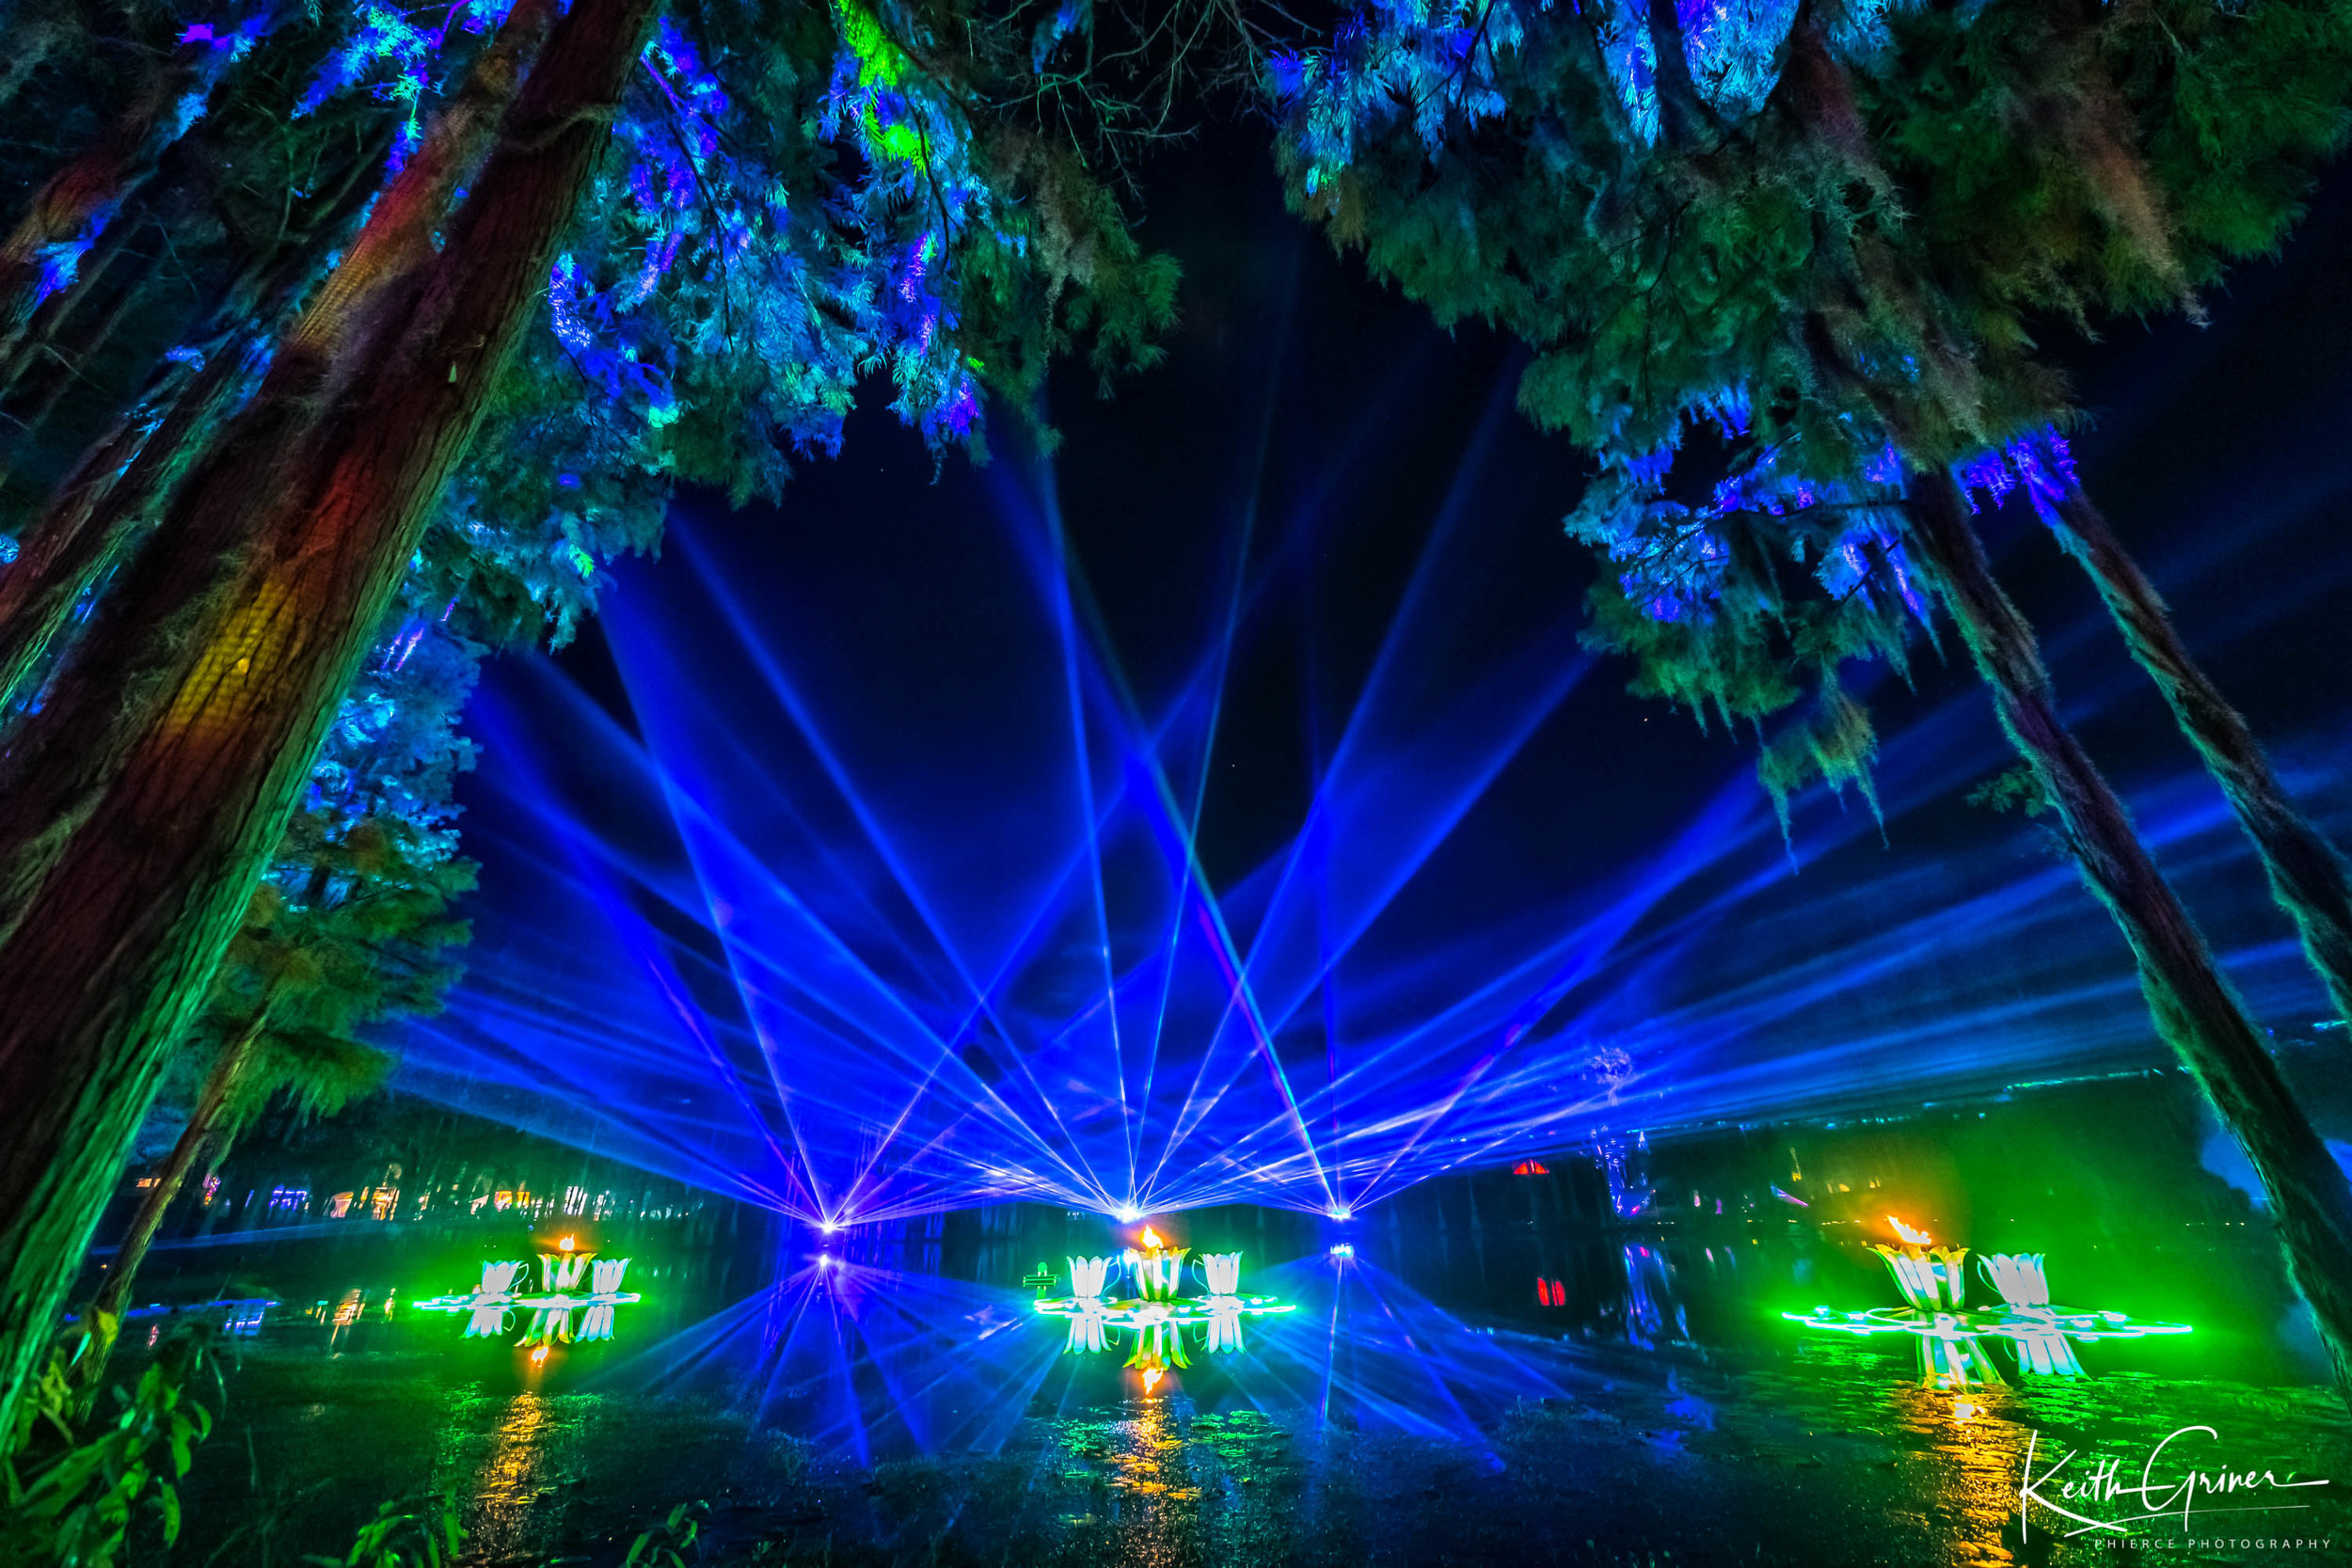 Hula_Spirit Lake_by Keith Griner 0D5_3196-Edit.jpg